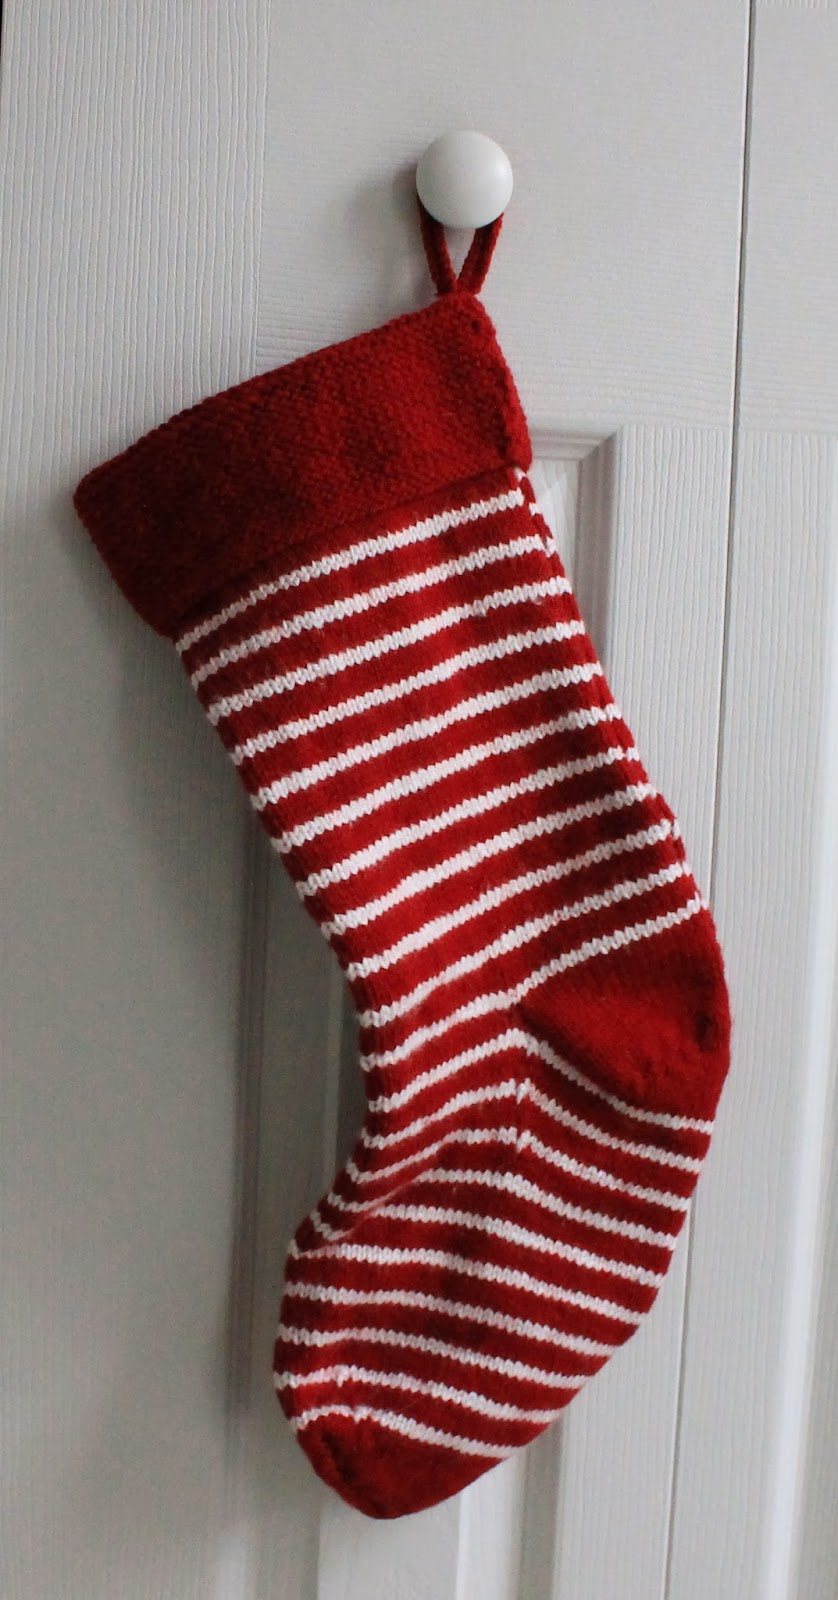 Christmas Stocking Knitting Pattern Straight Needles : Meg joins the navy knitting christmas stockings